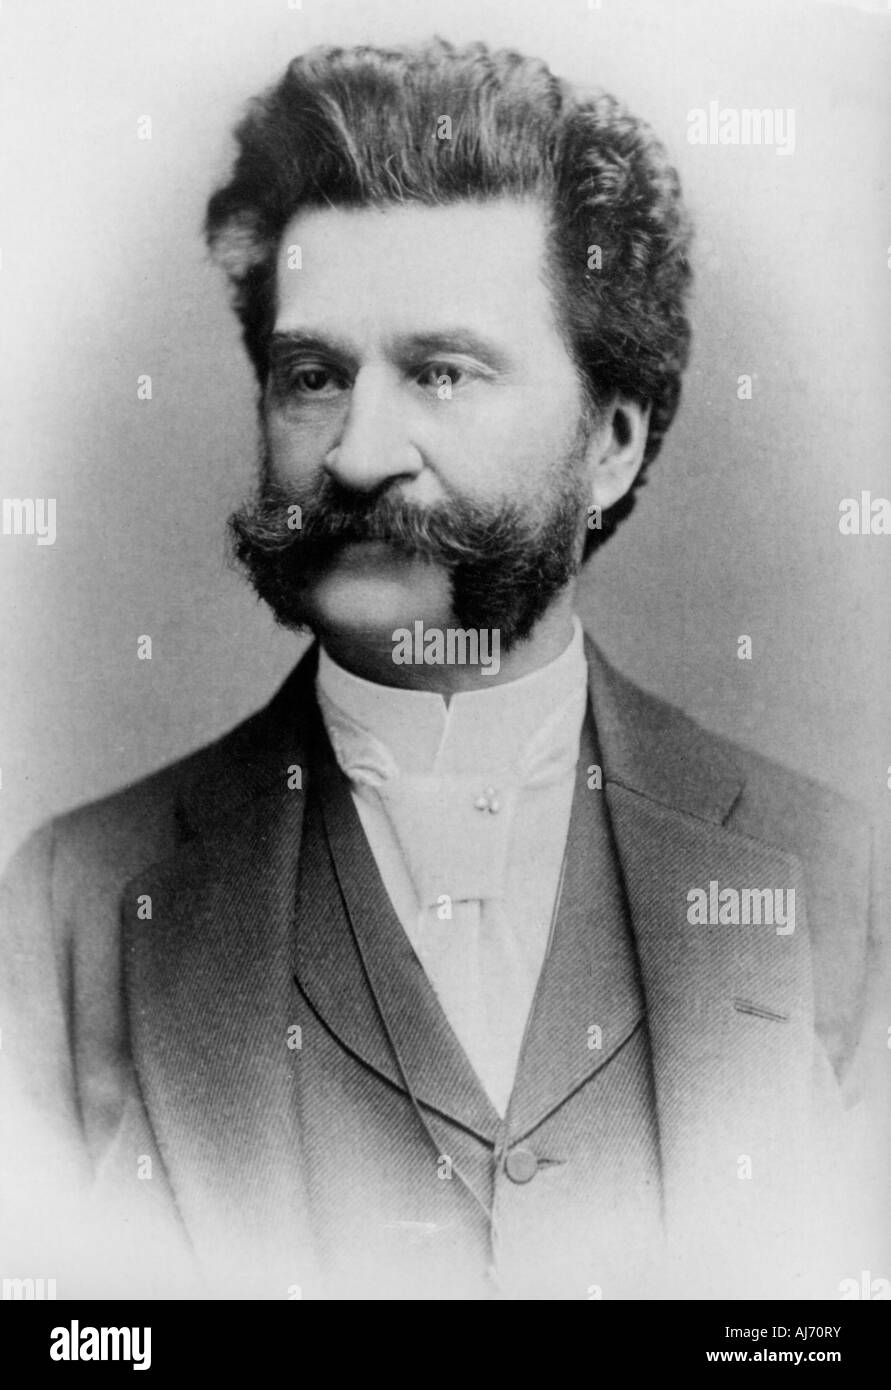 JOHANN STRAUSS II  Austrian composer 1825 to 1889 known as the Waltz King Stock Photo